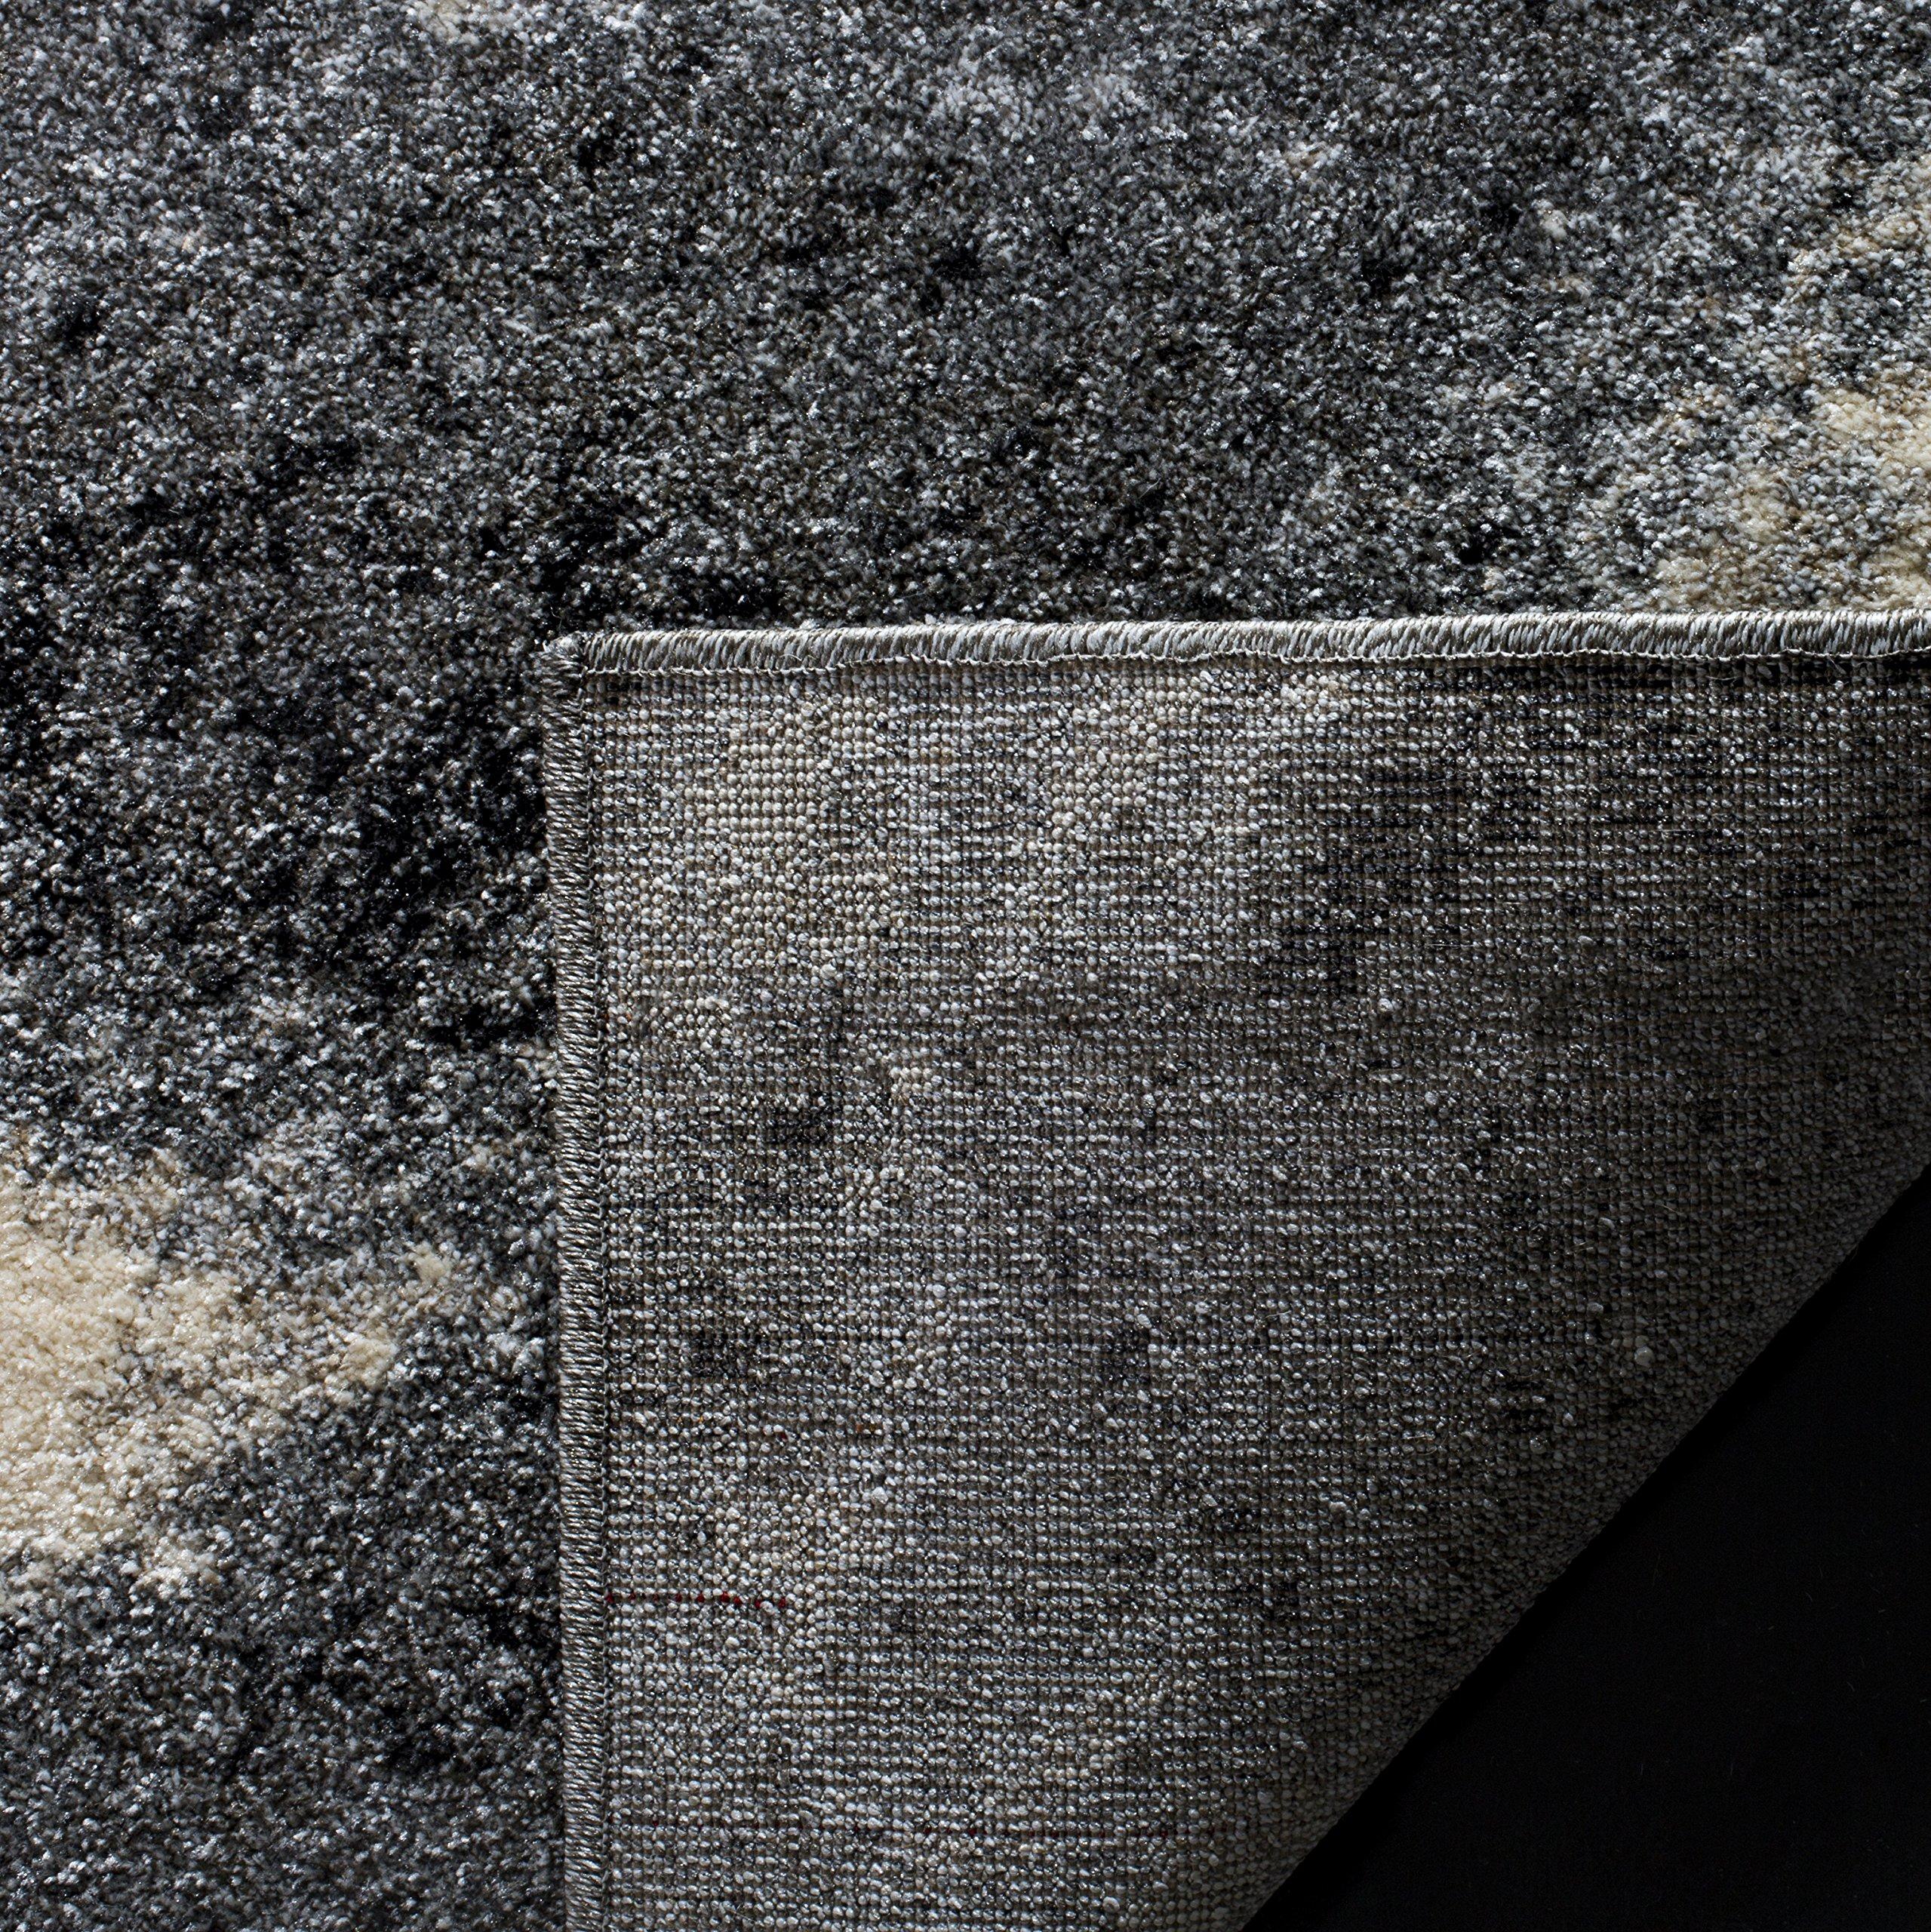 Safavieh Retro Collection RET2891-8012 Modern Abstract